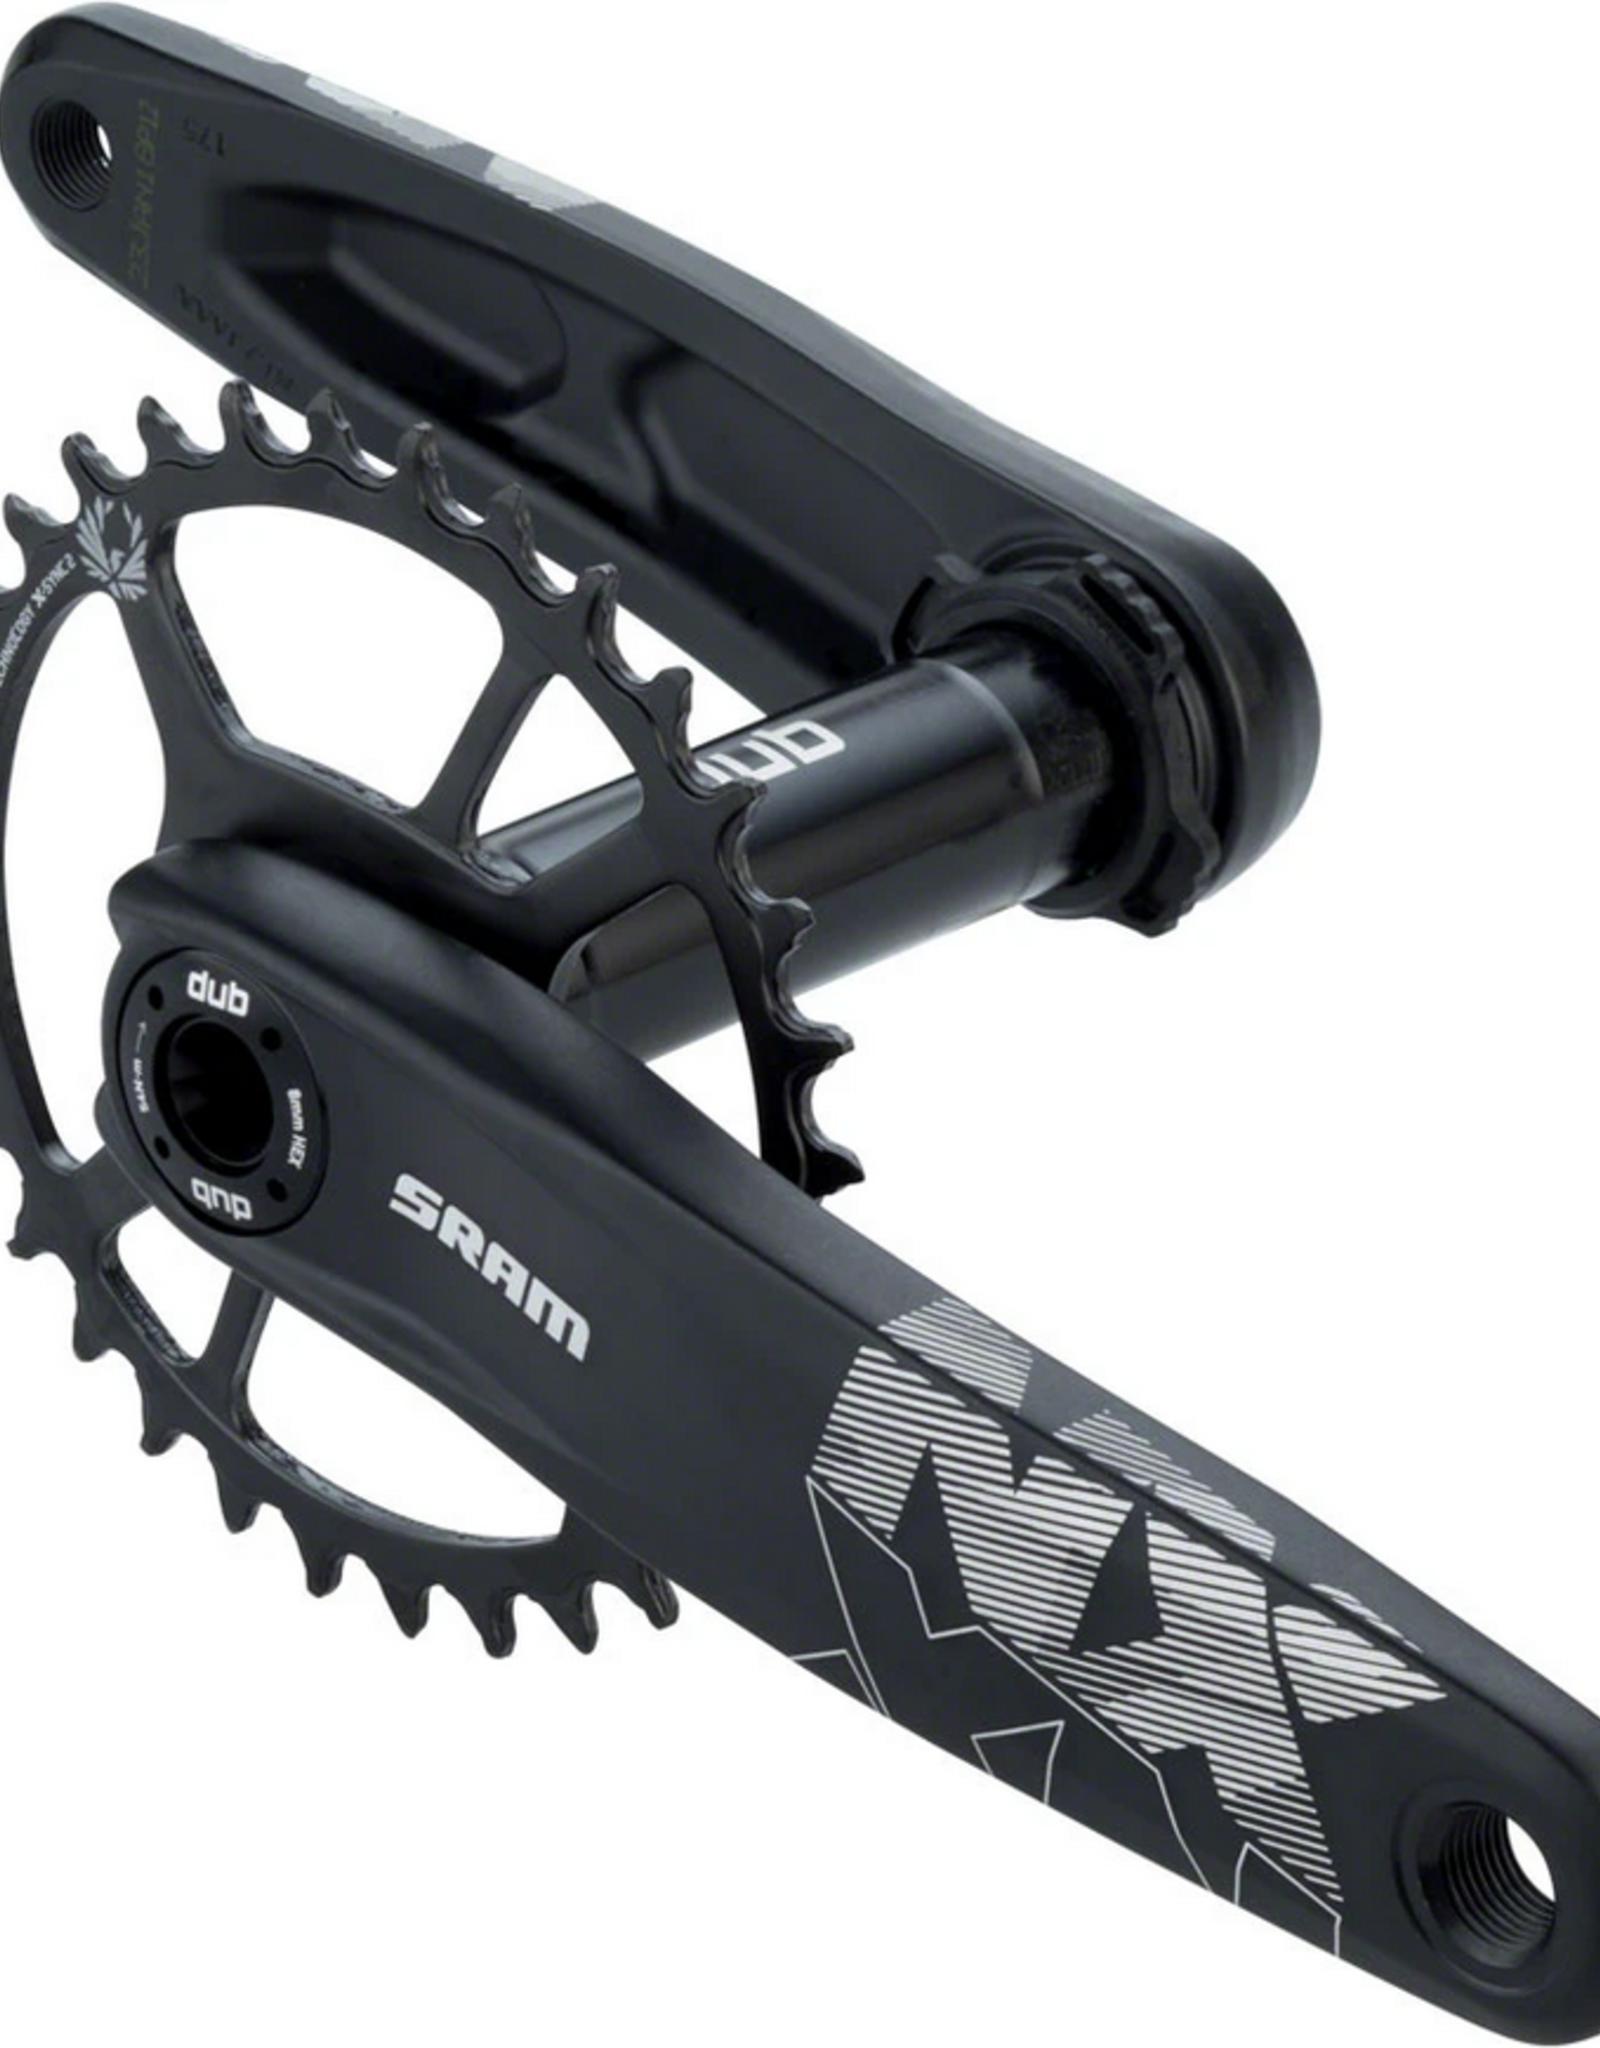 SRAM SRAM NX Eagle Boost Crankset - 175mm, 12-Speed, 32t, Direct Mount, DUB Spindle Interface, Black